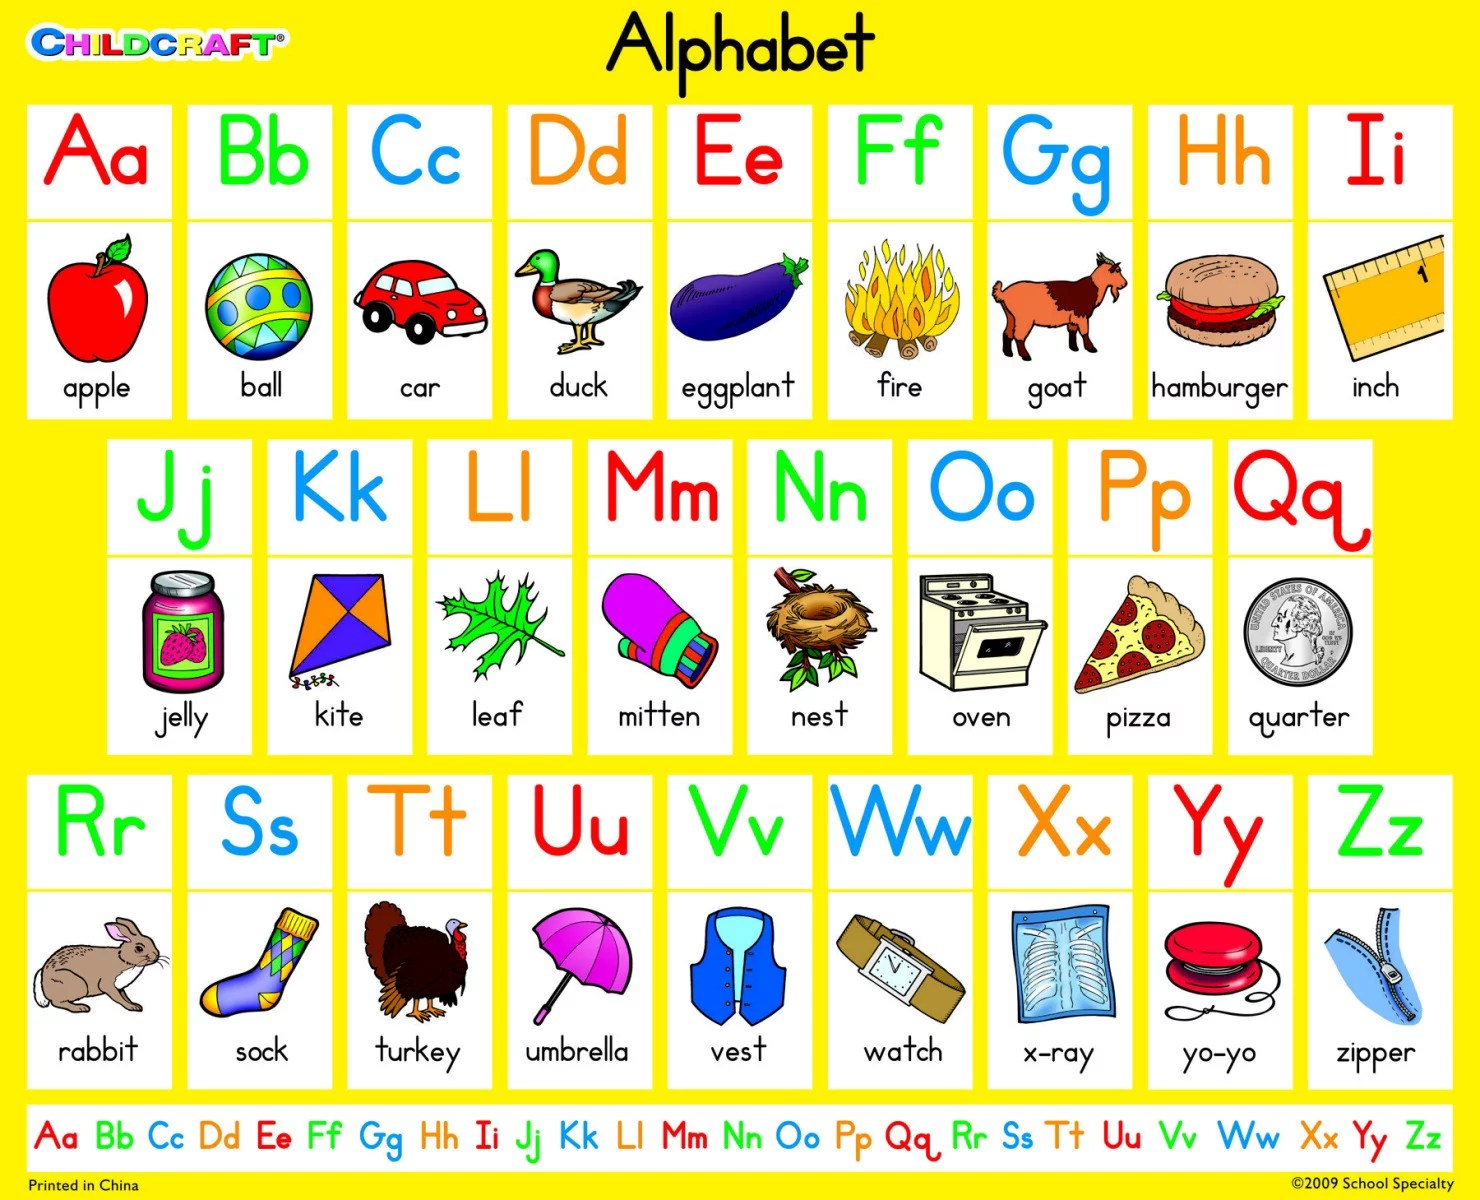 Childcraft English Alphabet Literacy Classroom Chart